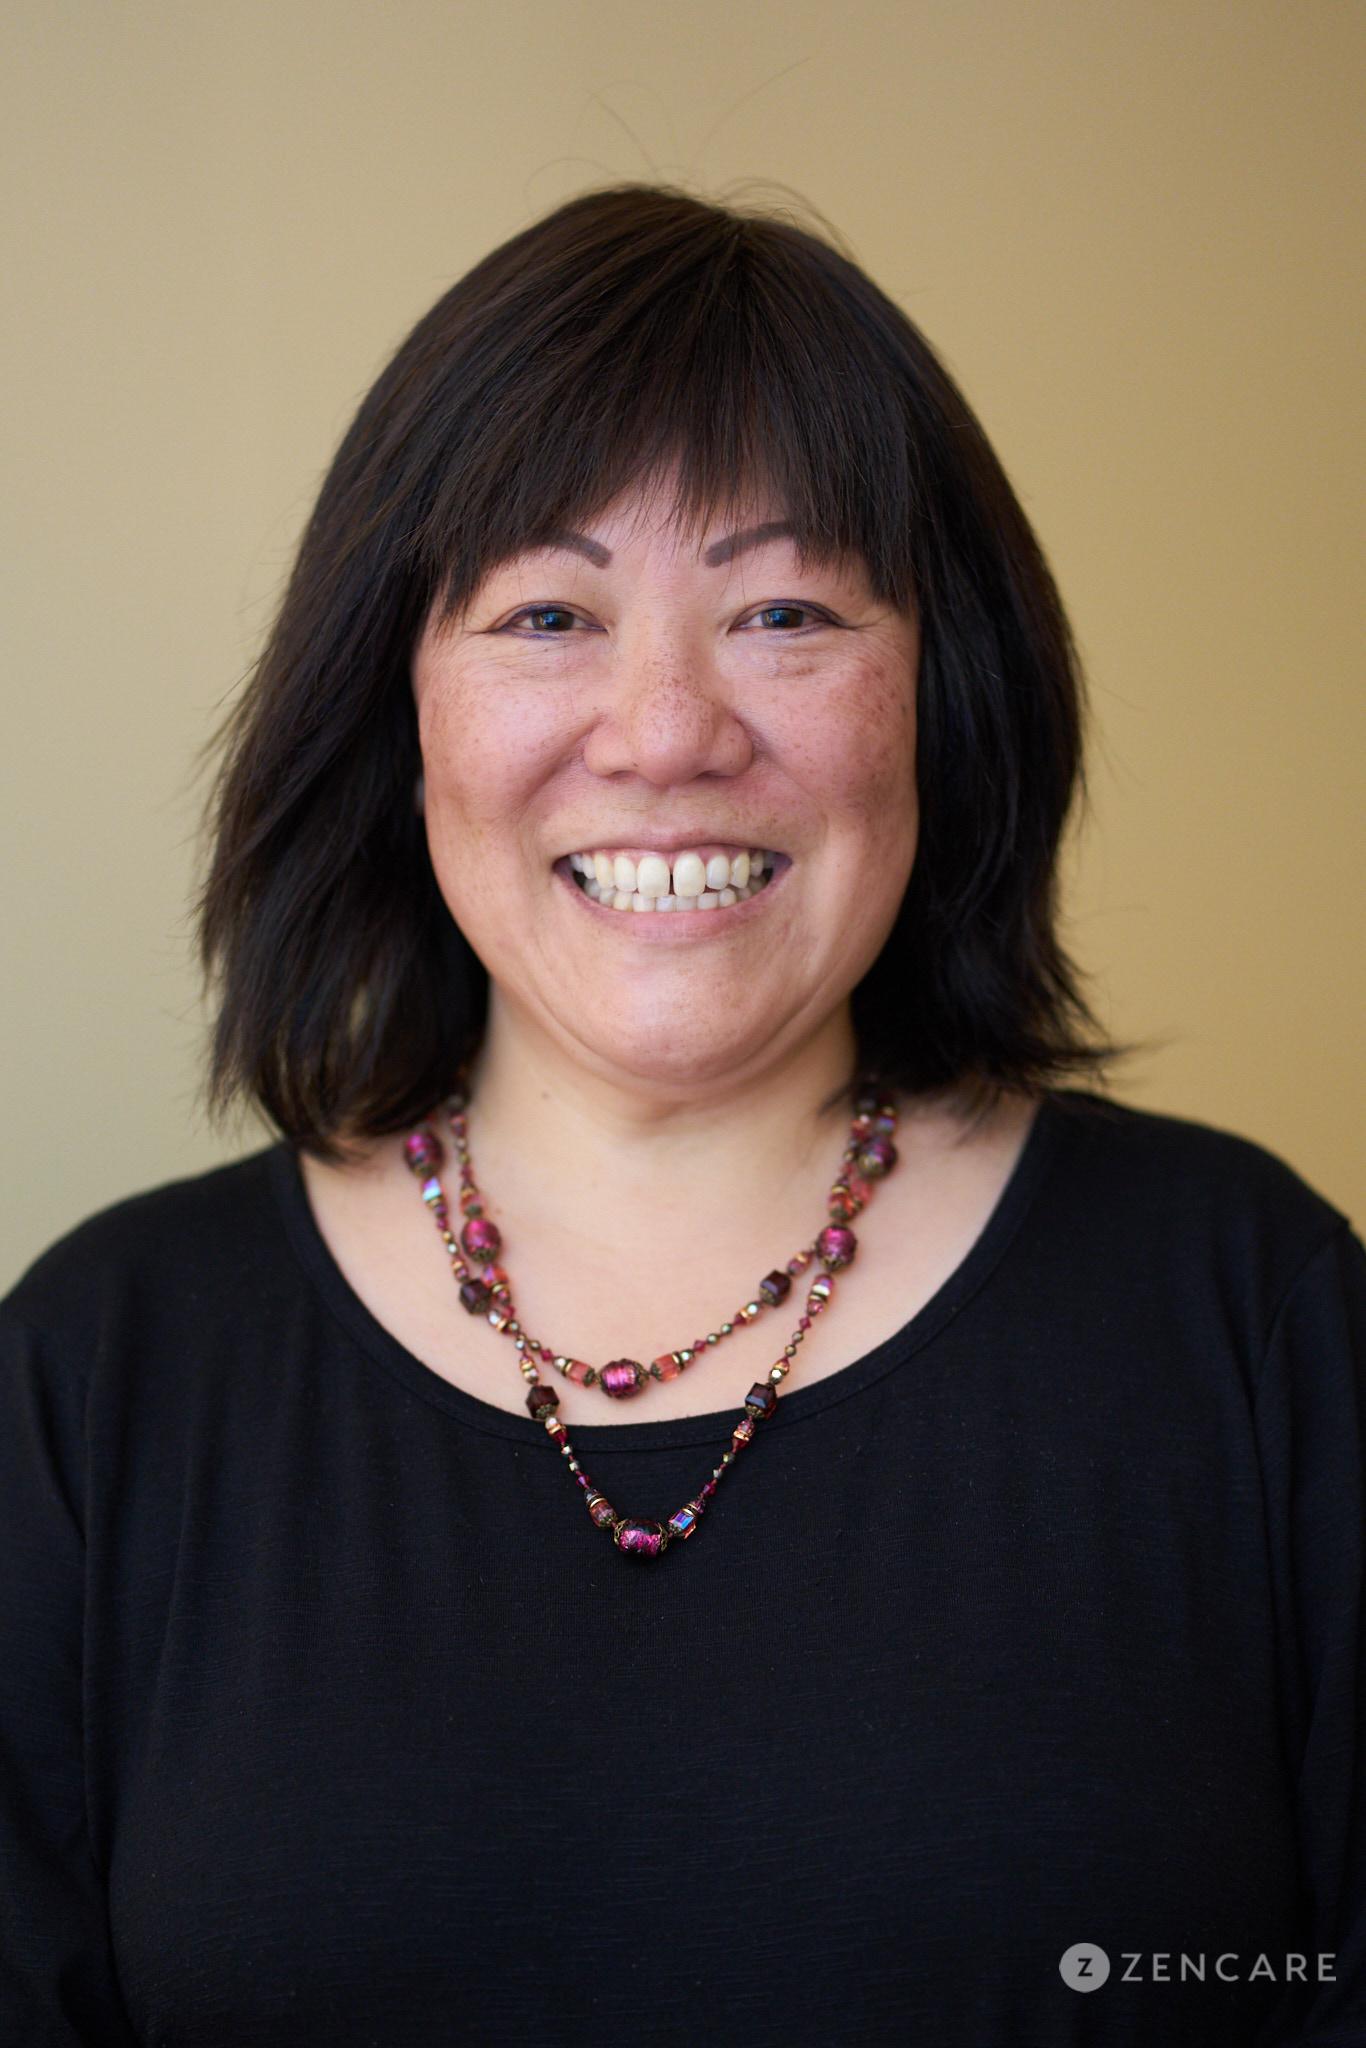 Dana Oshiro LICSW - Therapist in Lexington MA - 3.jpg